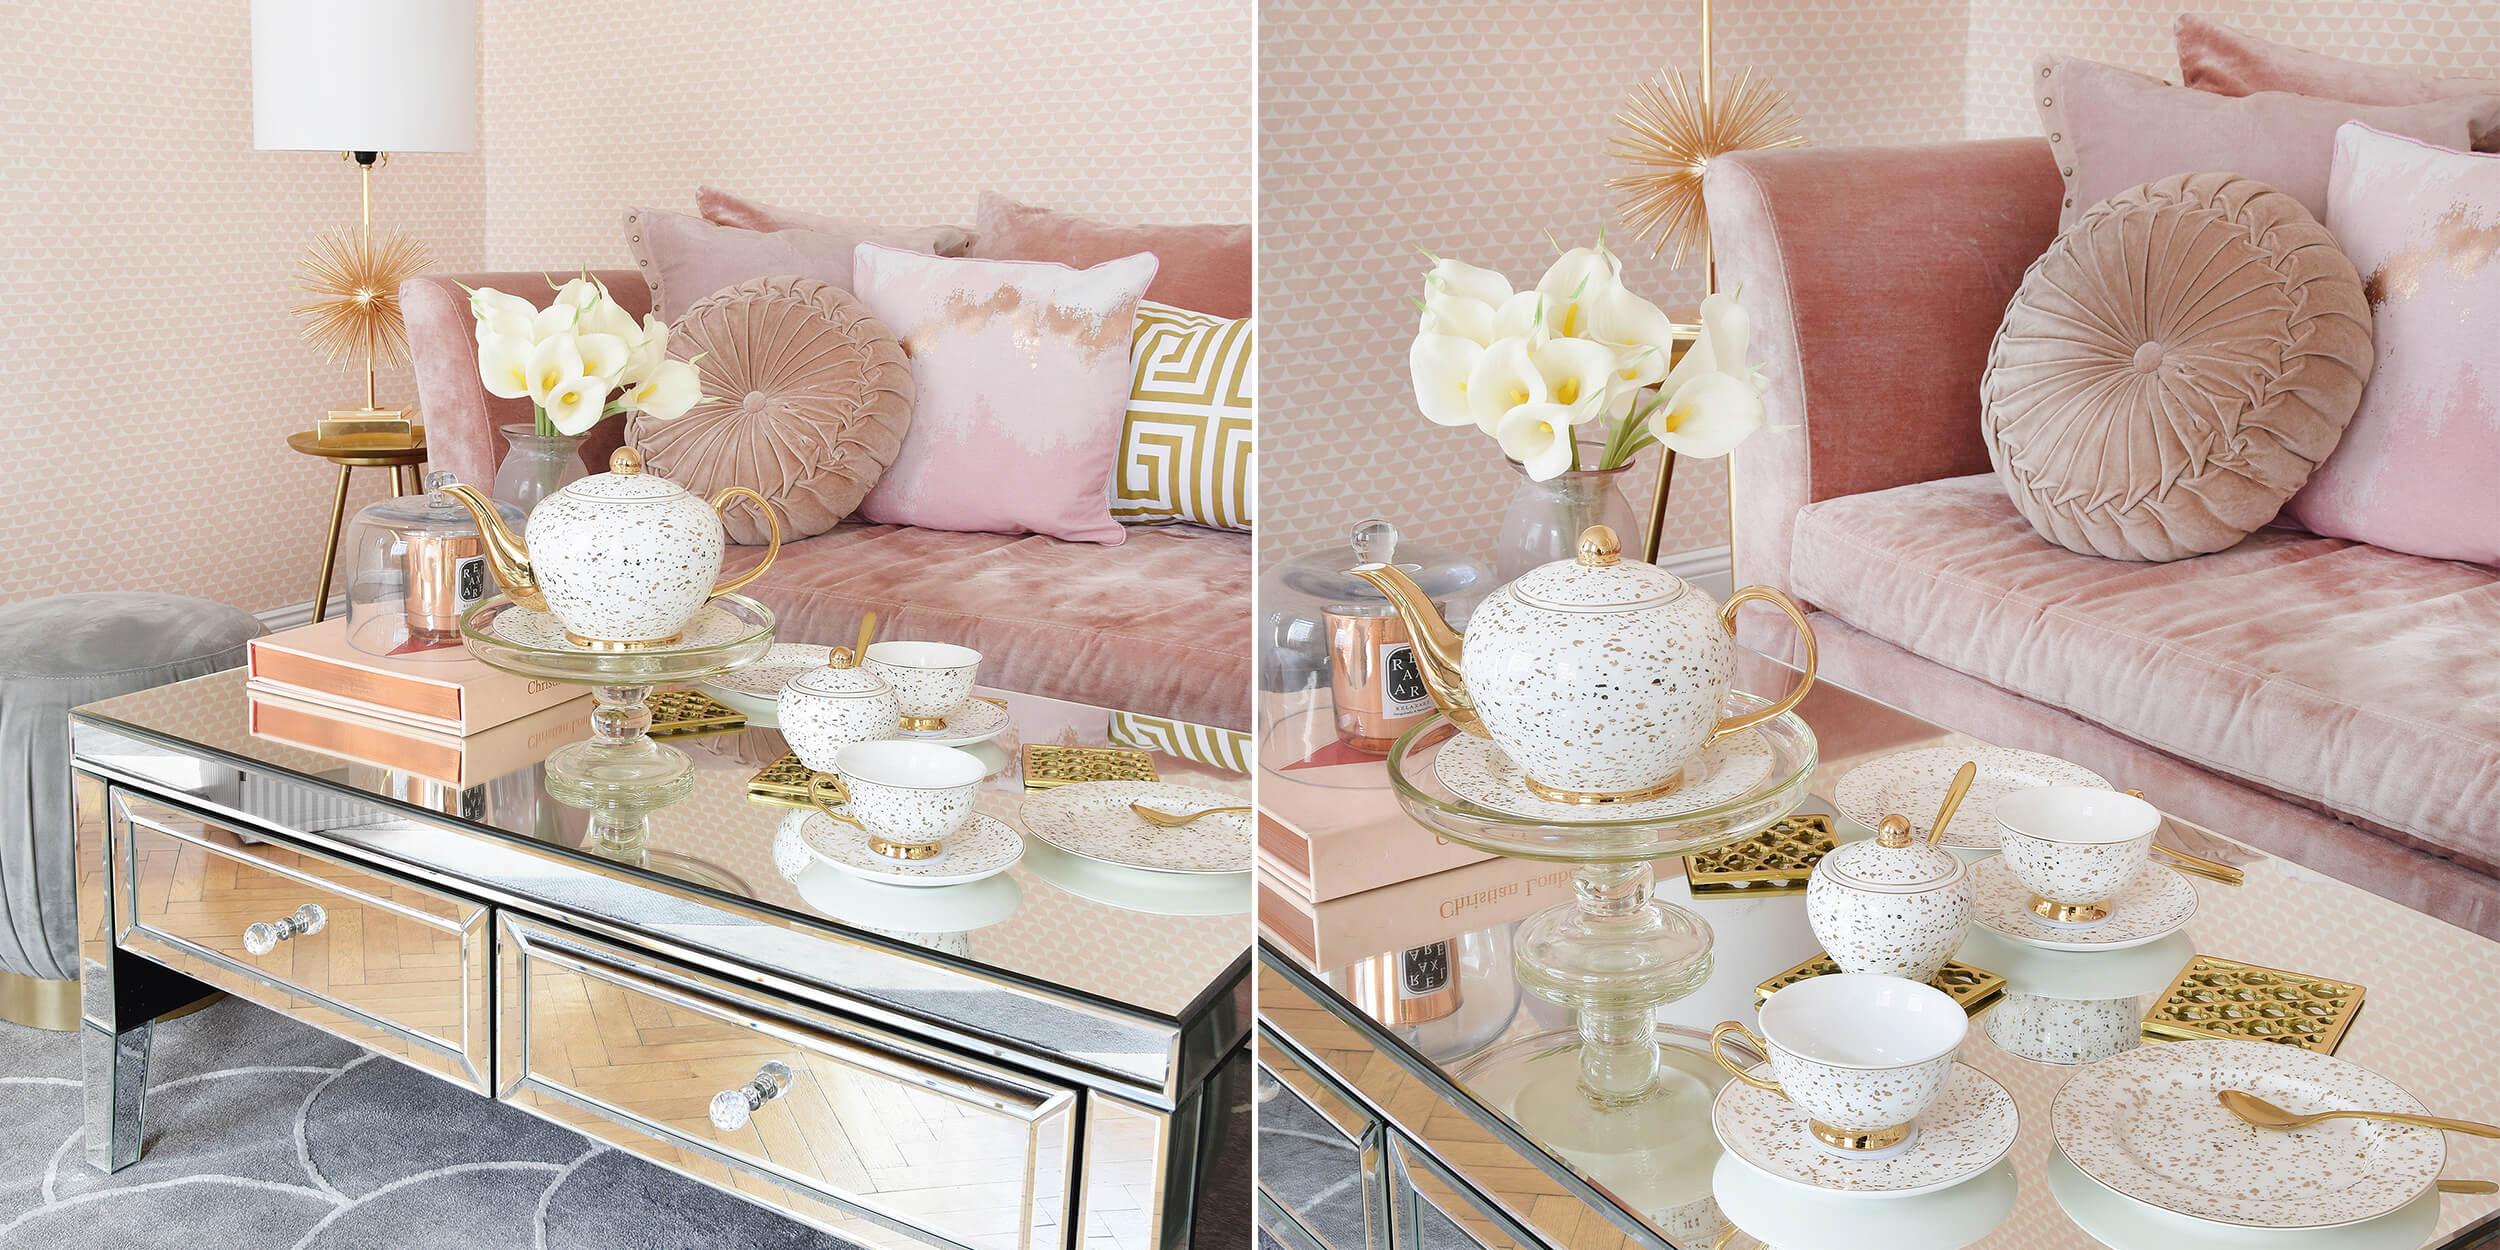 Verspielt & Elegant: Teeservice in Weiß & Gold - #InstaShop